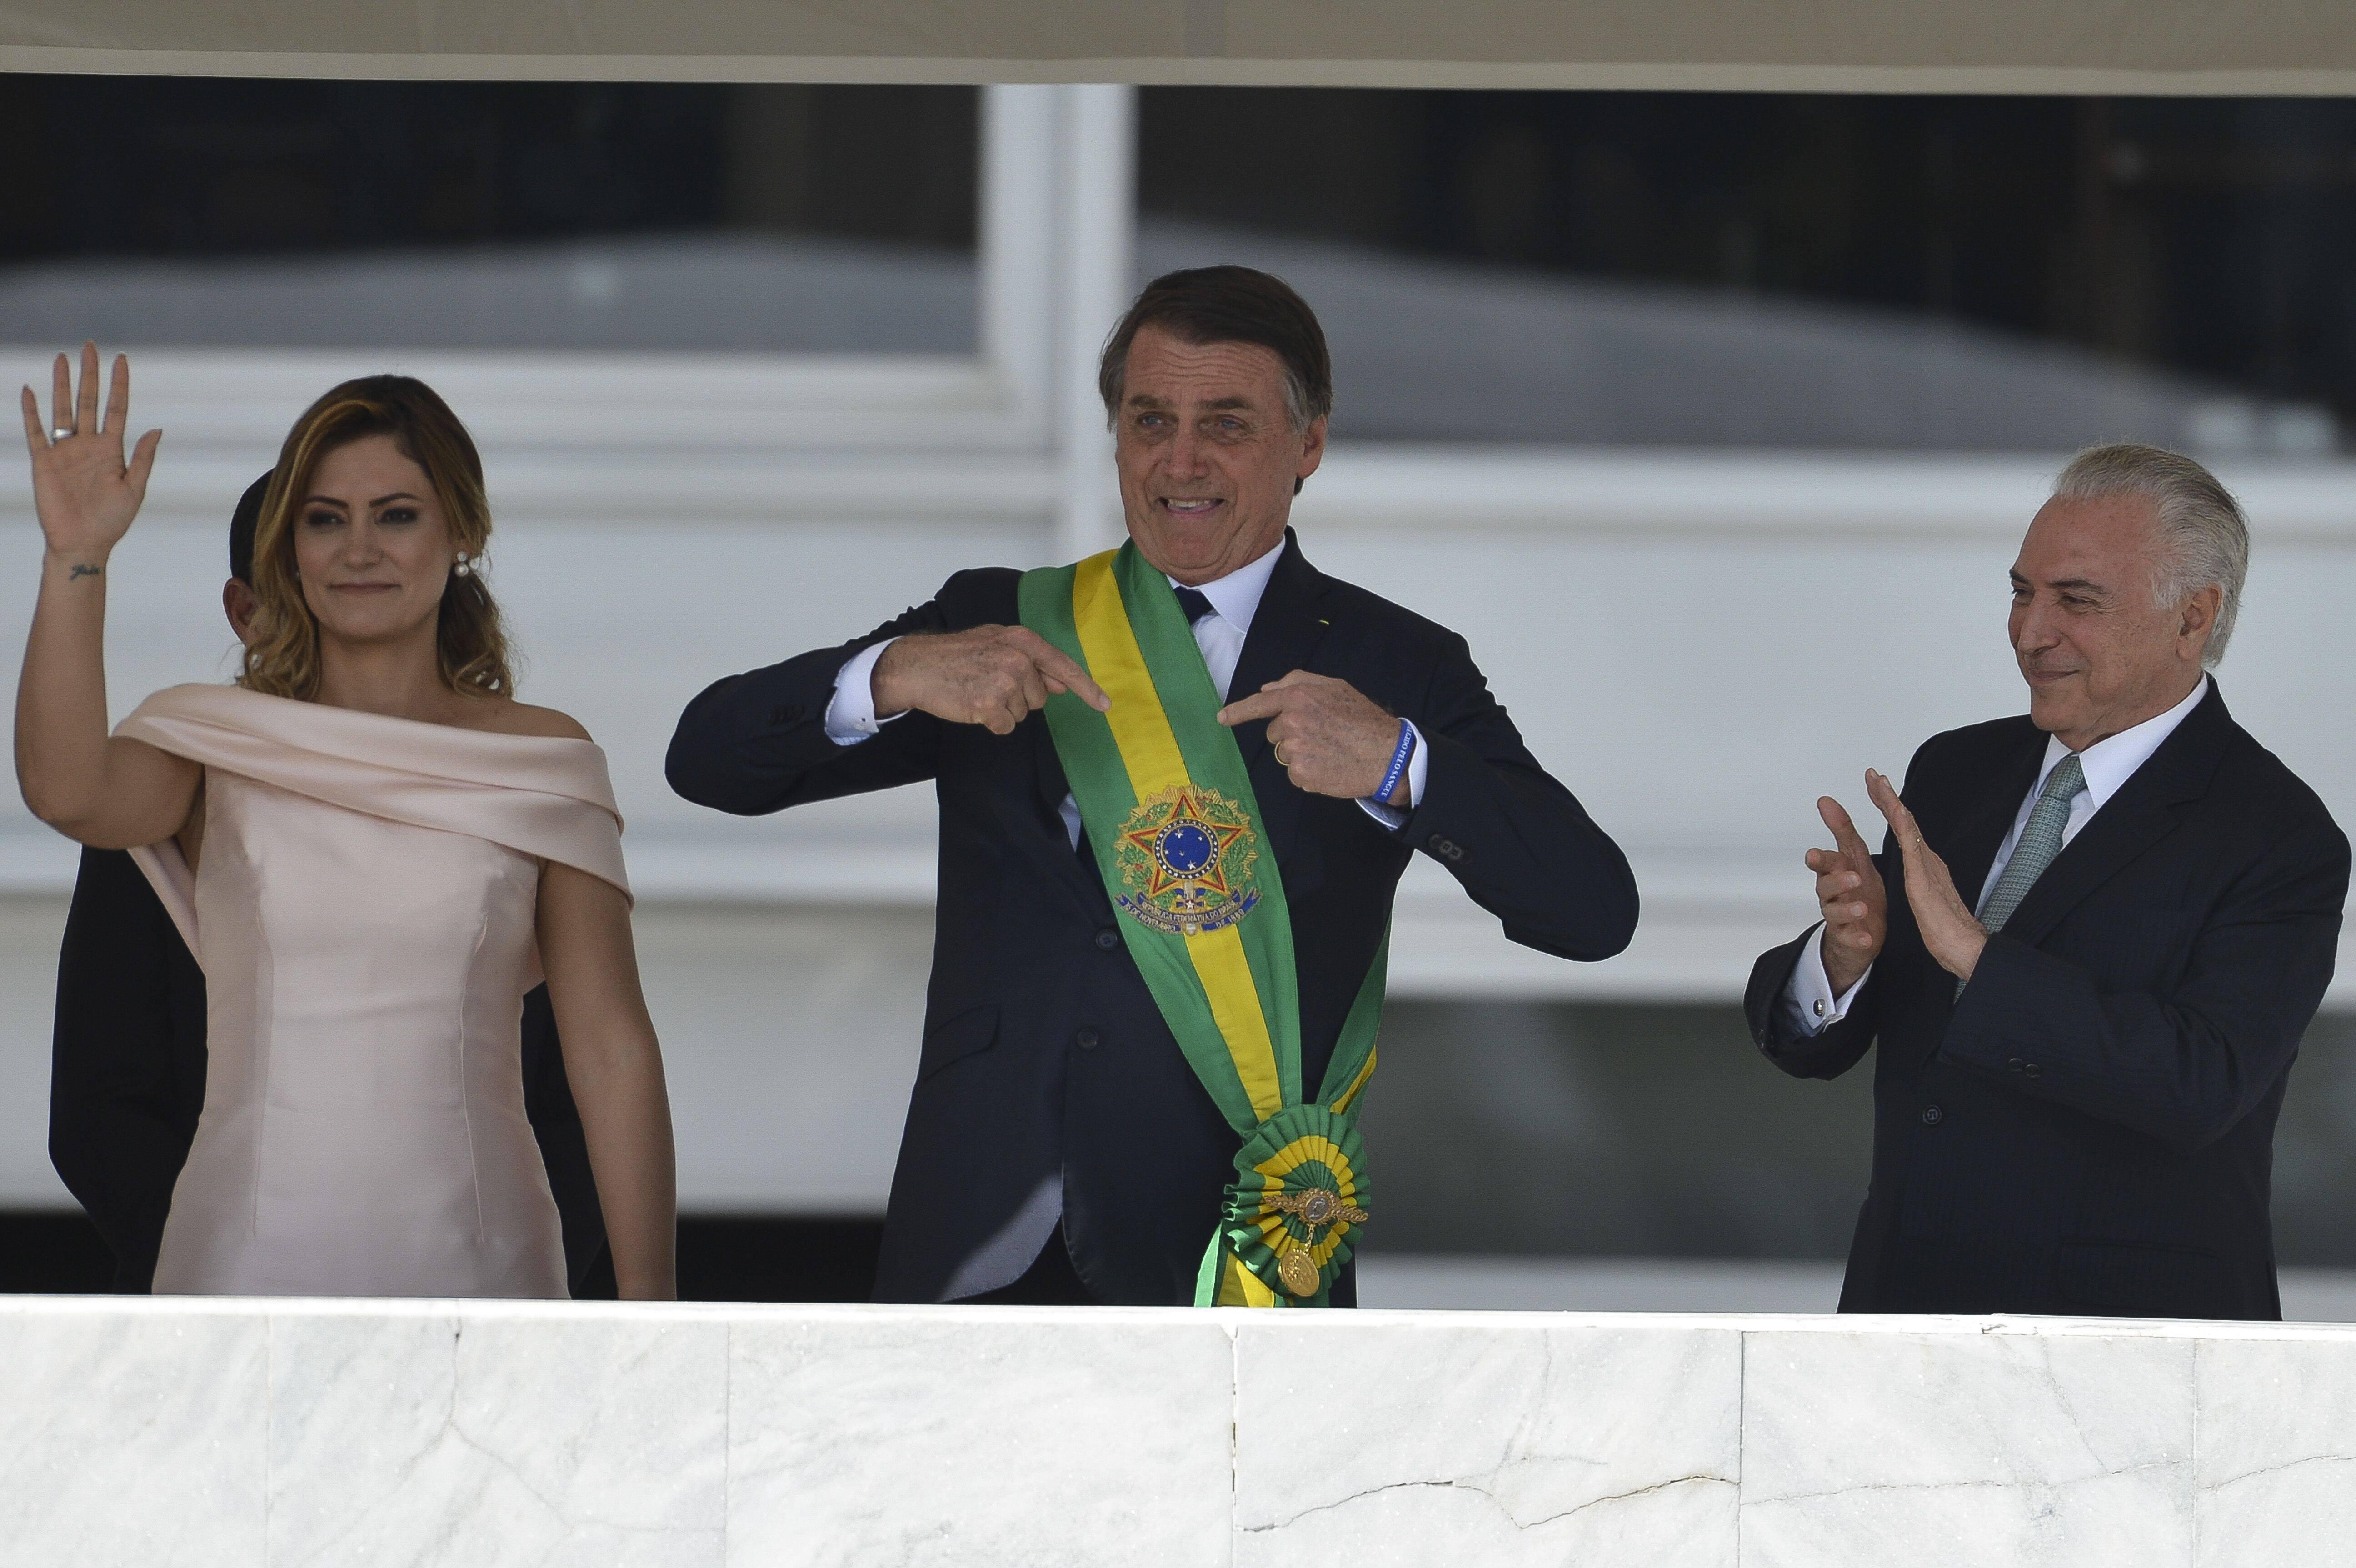 Jair Bolsonaro recebeu a faixa presidencial de Michel Temer no parlatório do Palácio do Planalto. Foto: Marcelo Camargo/Agência Brasil - 1.1.19